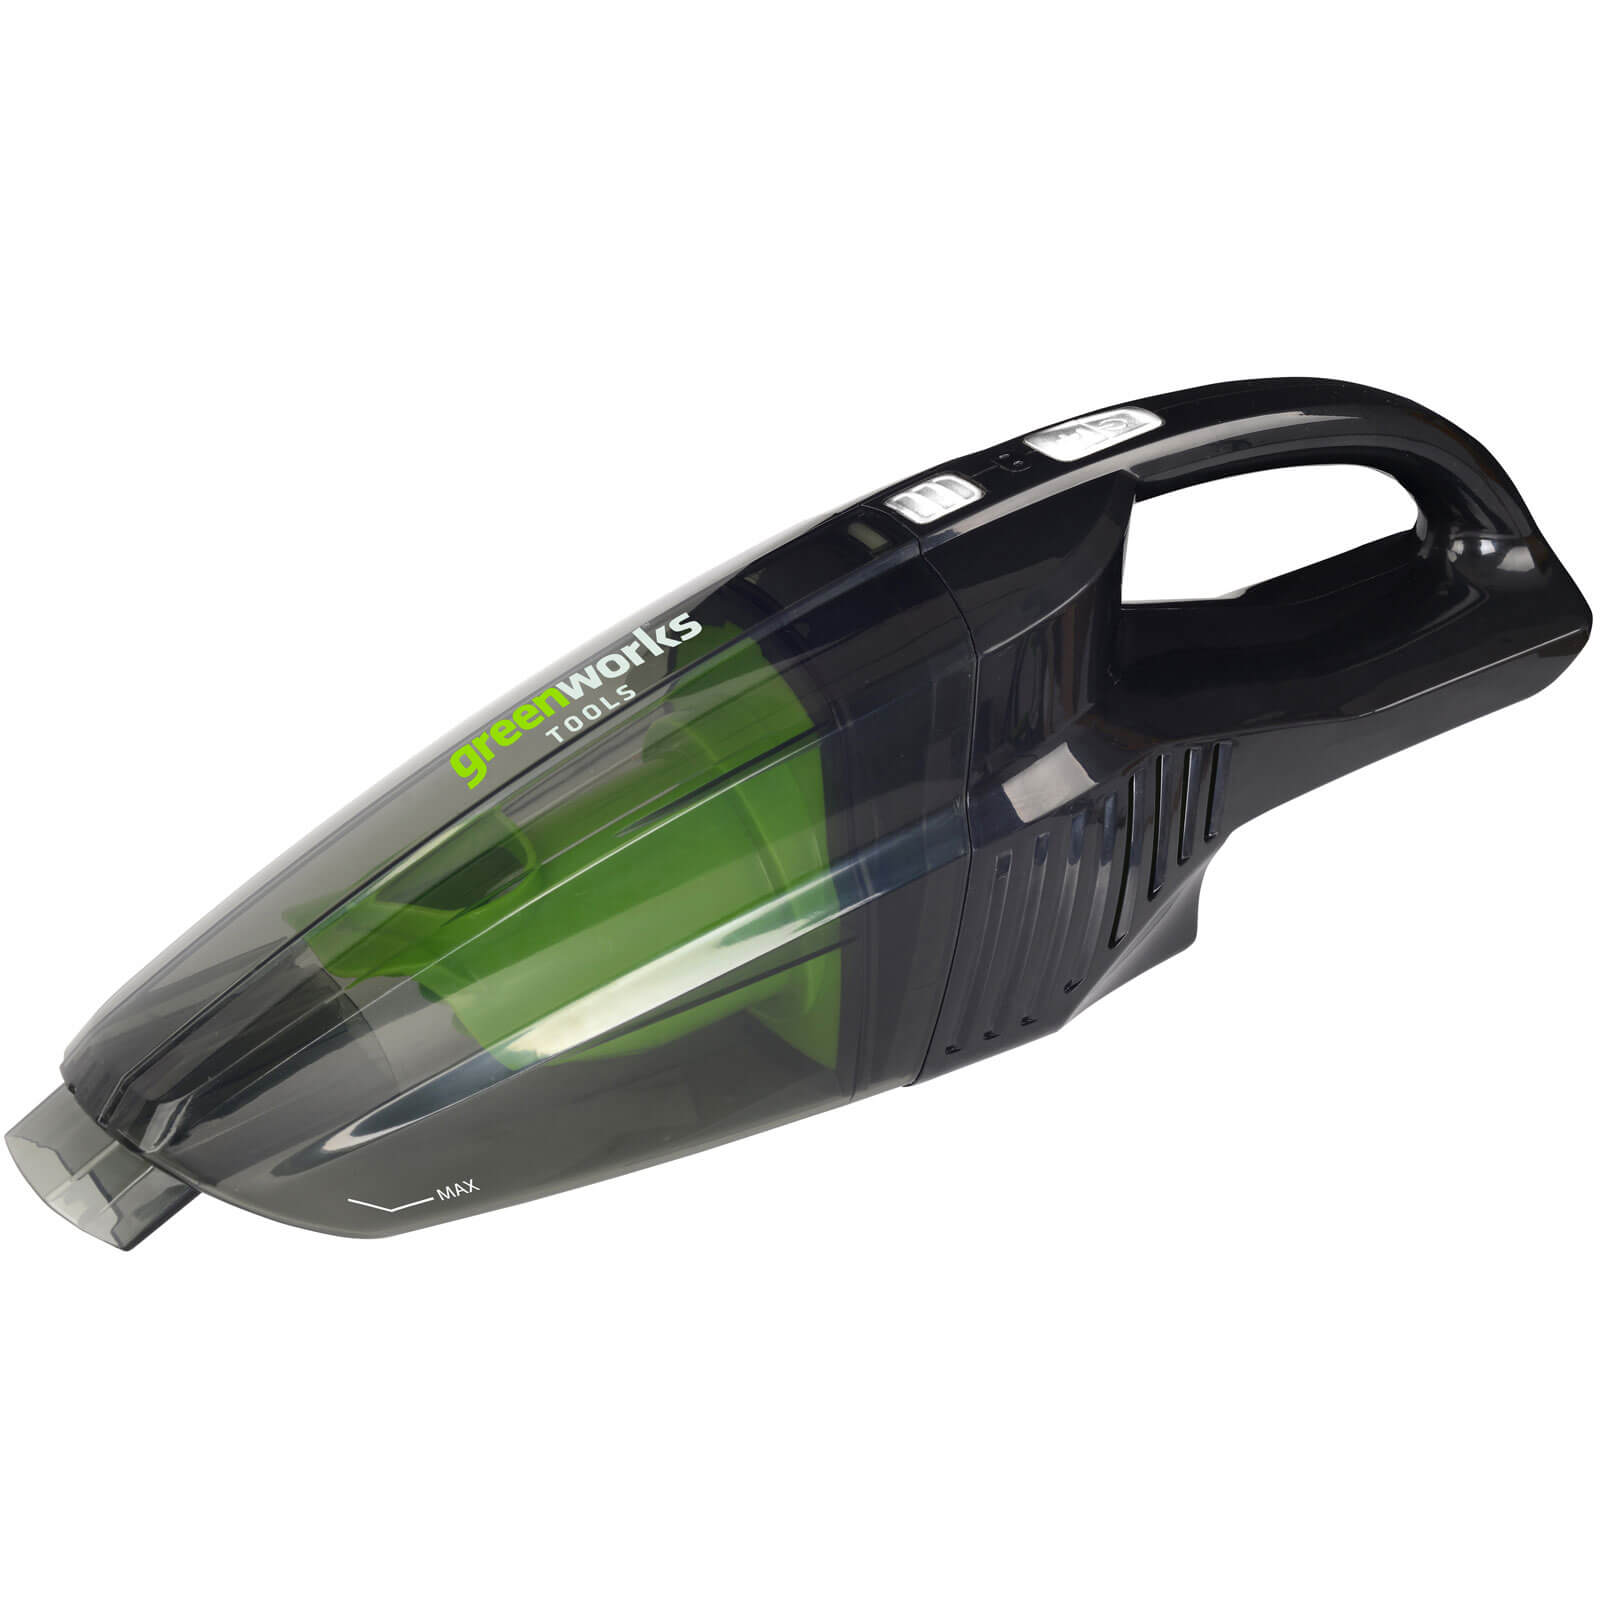 Greenworks G24HV 24v Cordless Wet & Dry Hand Held Vacuum Cleaner No Batteries No Charger